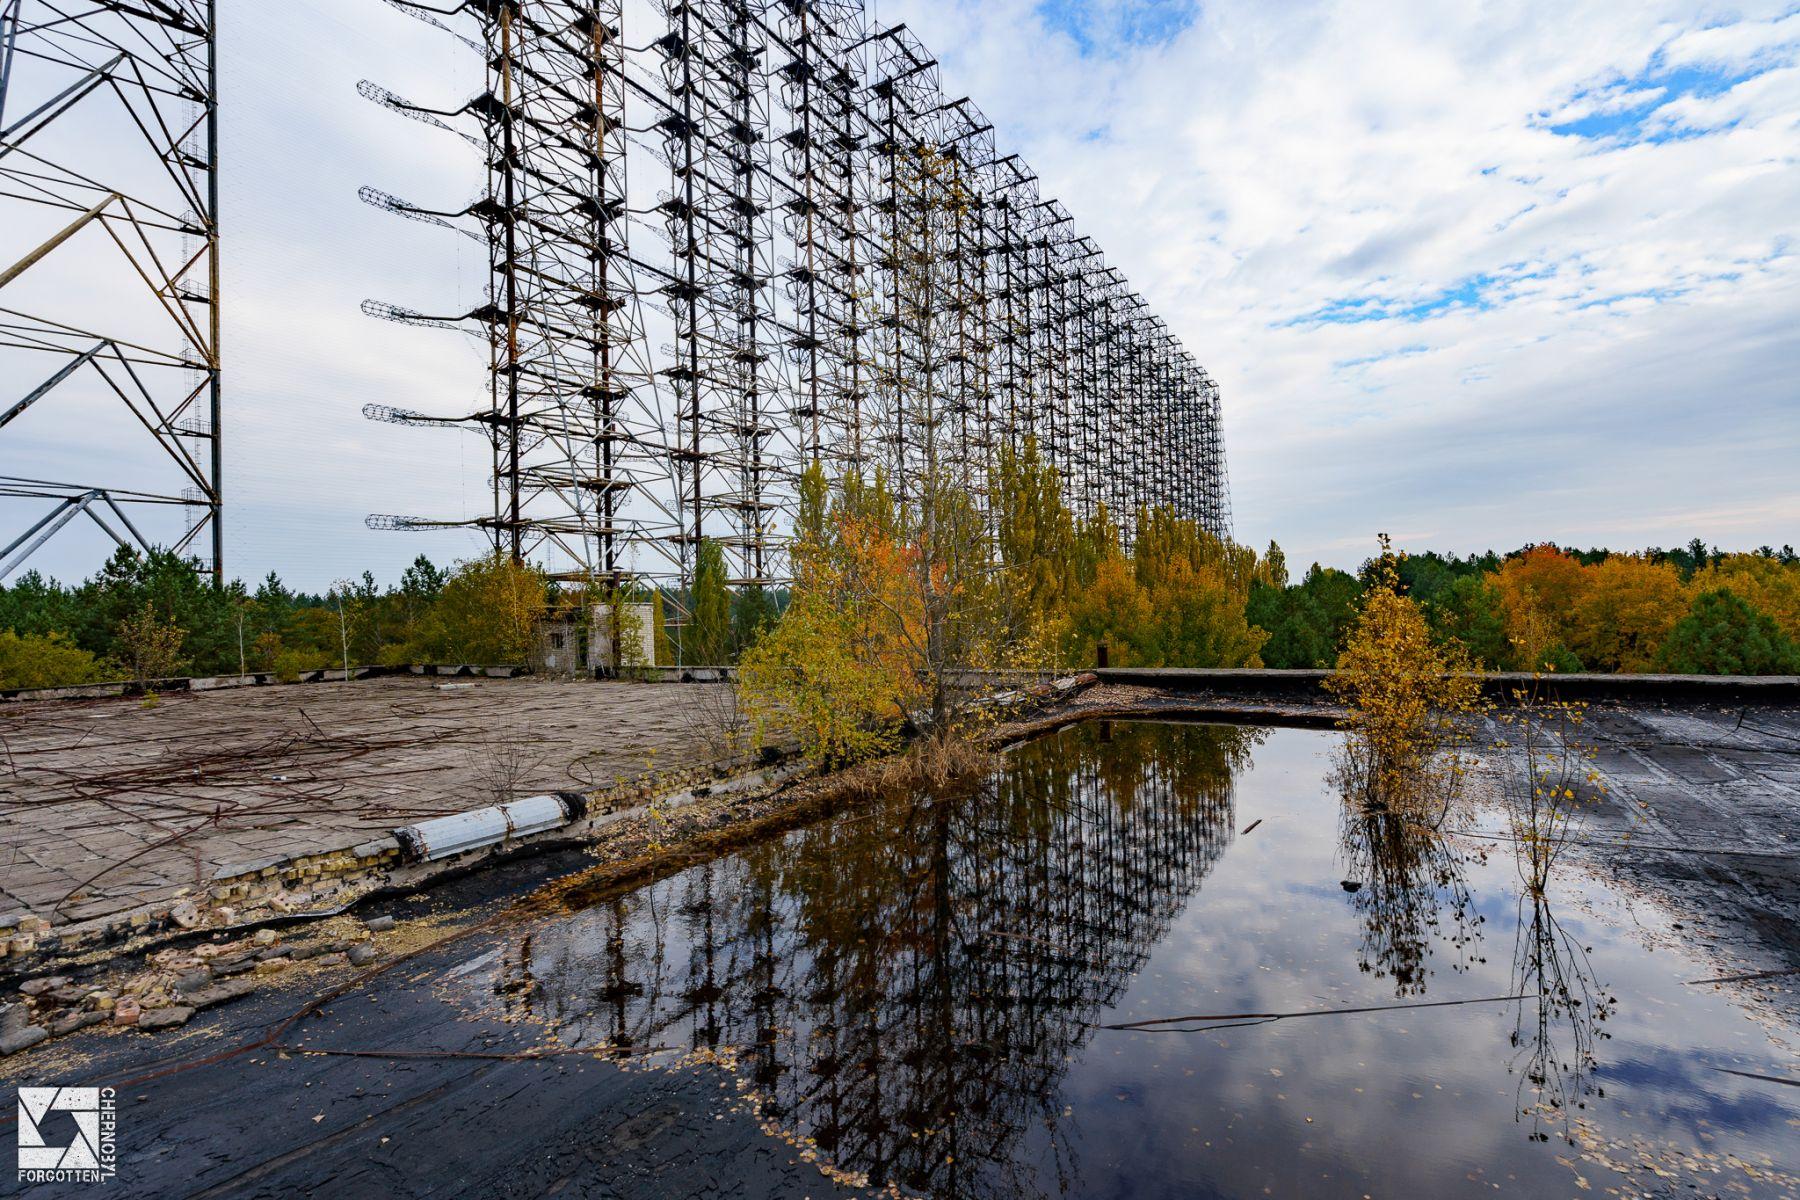 Duga Radar Electrical Substation